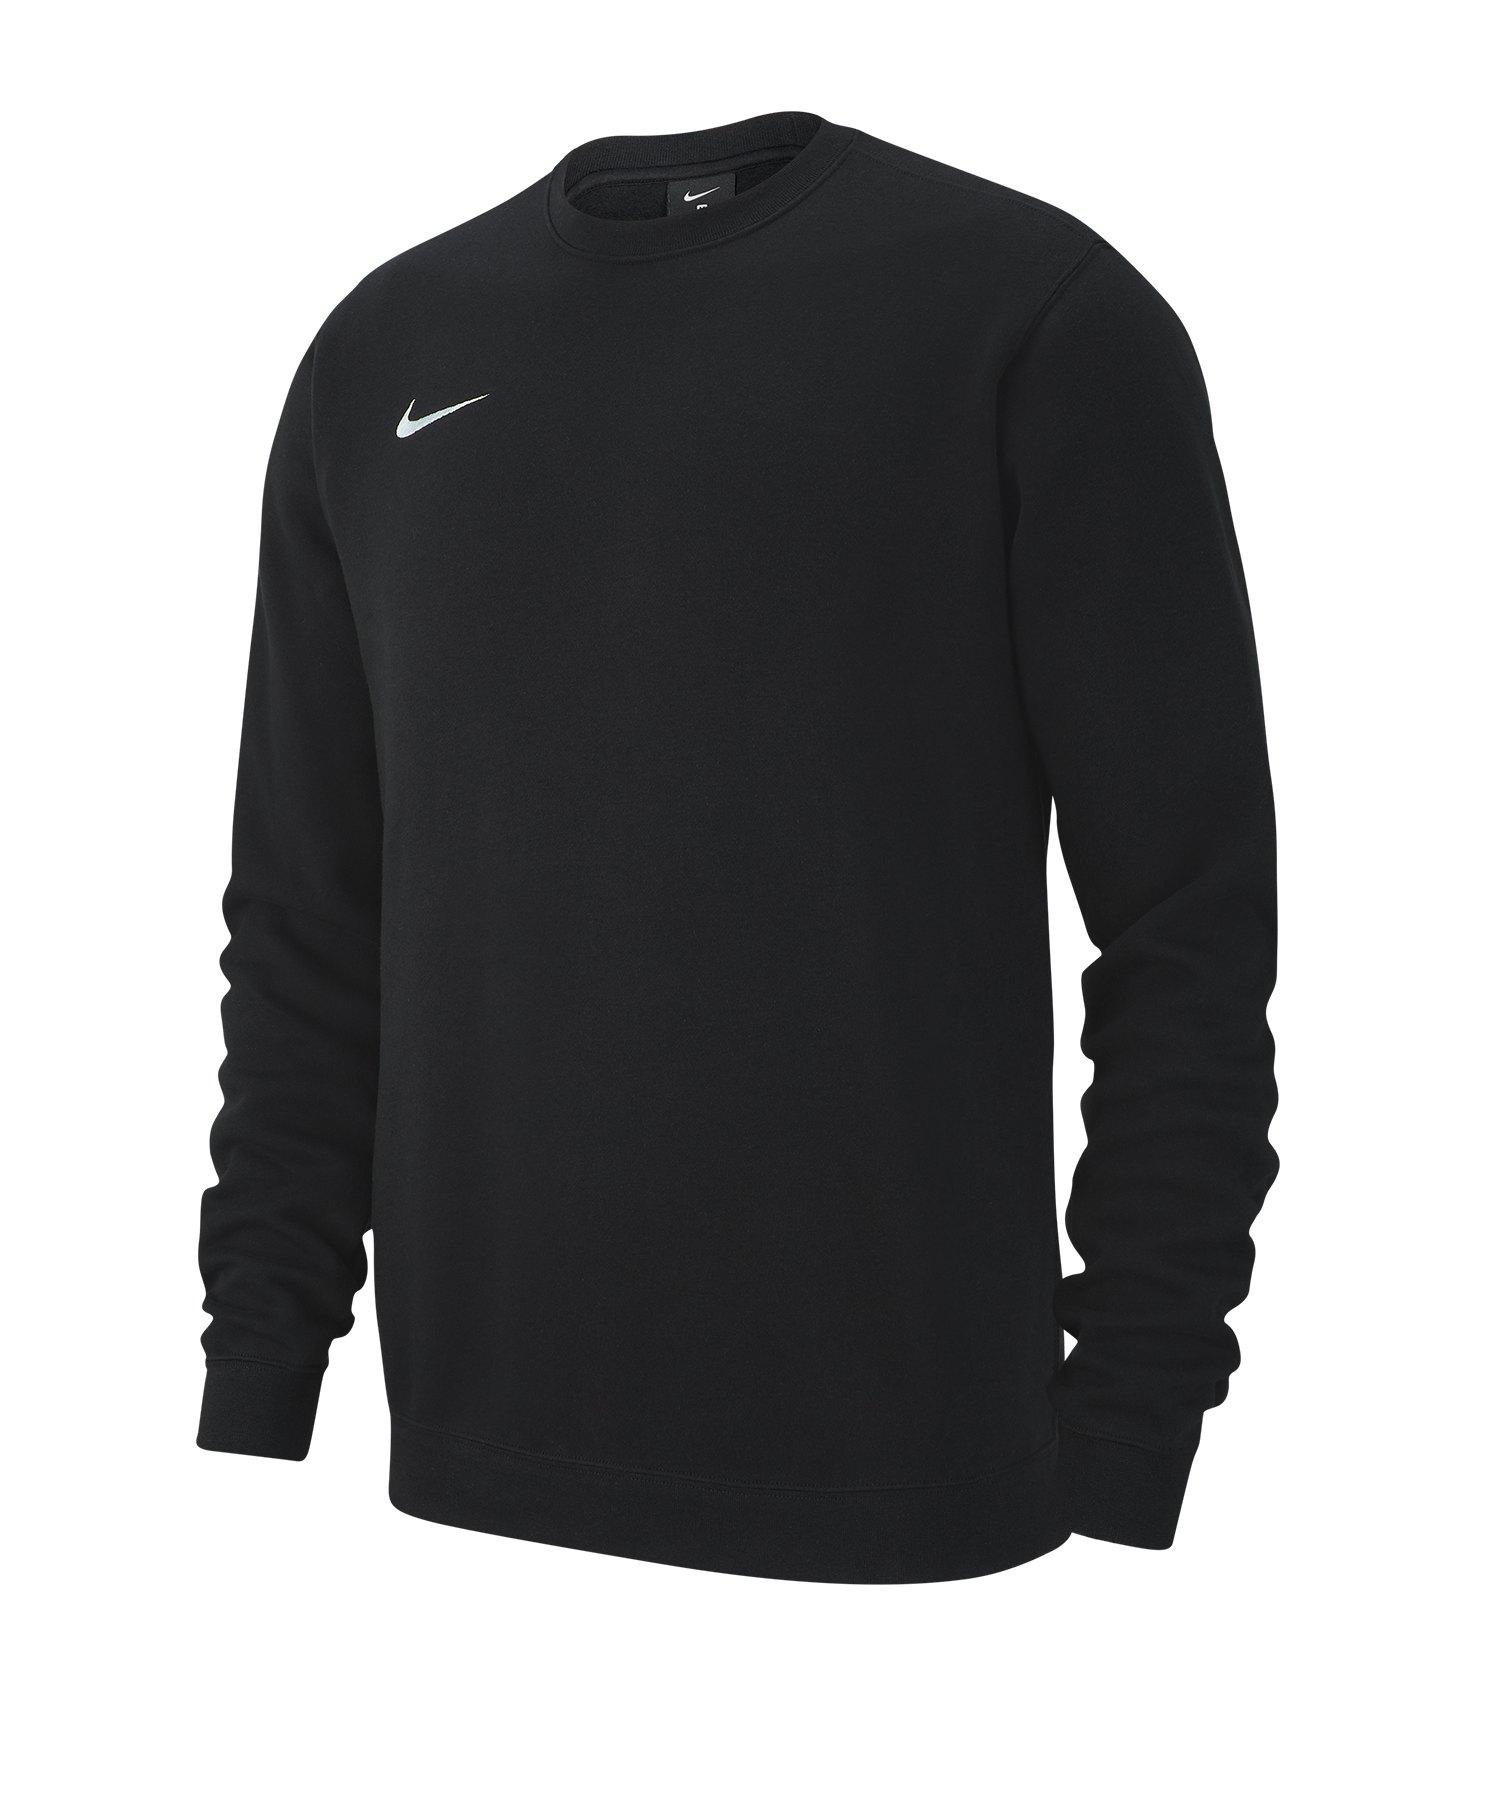 Nike Team Club 19 Fleece Sweatshirt Schwarz F010 - schwarz